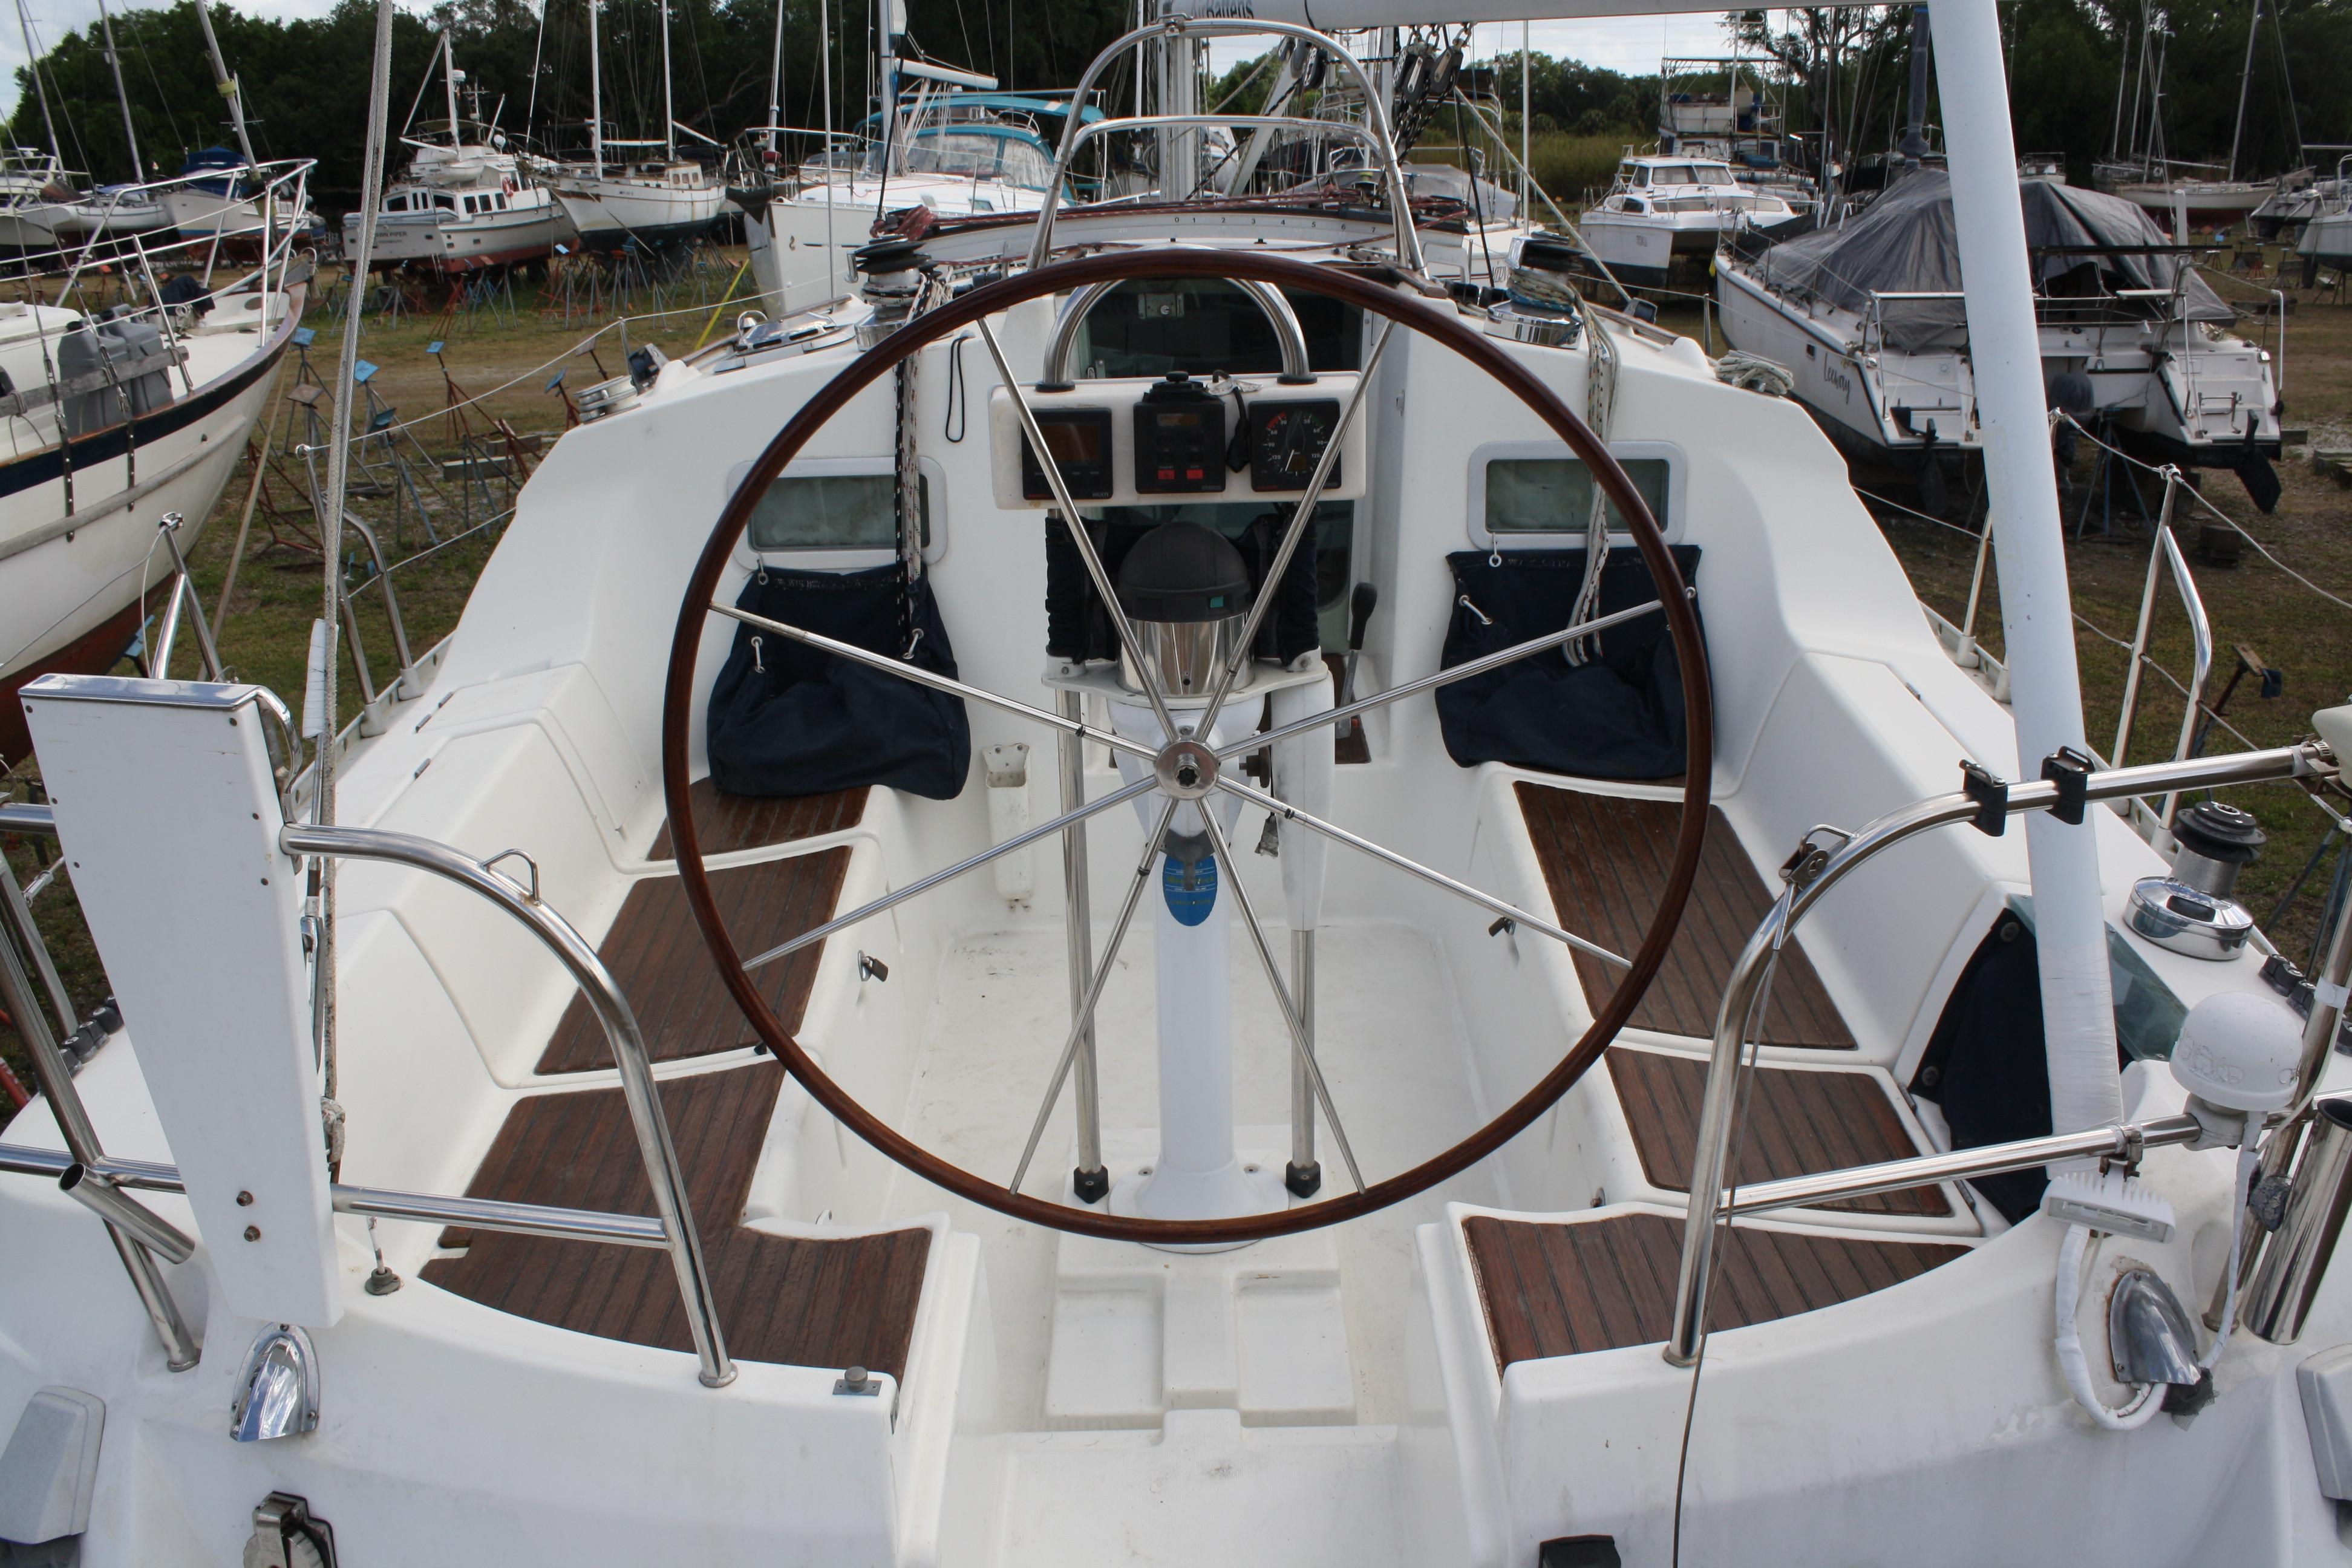 Beautiful Mahogany wheel and teak seats in a large comfortable cockpit